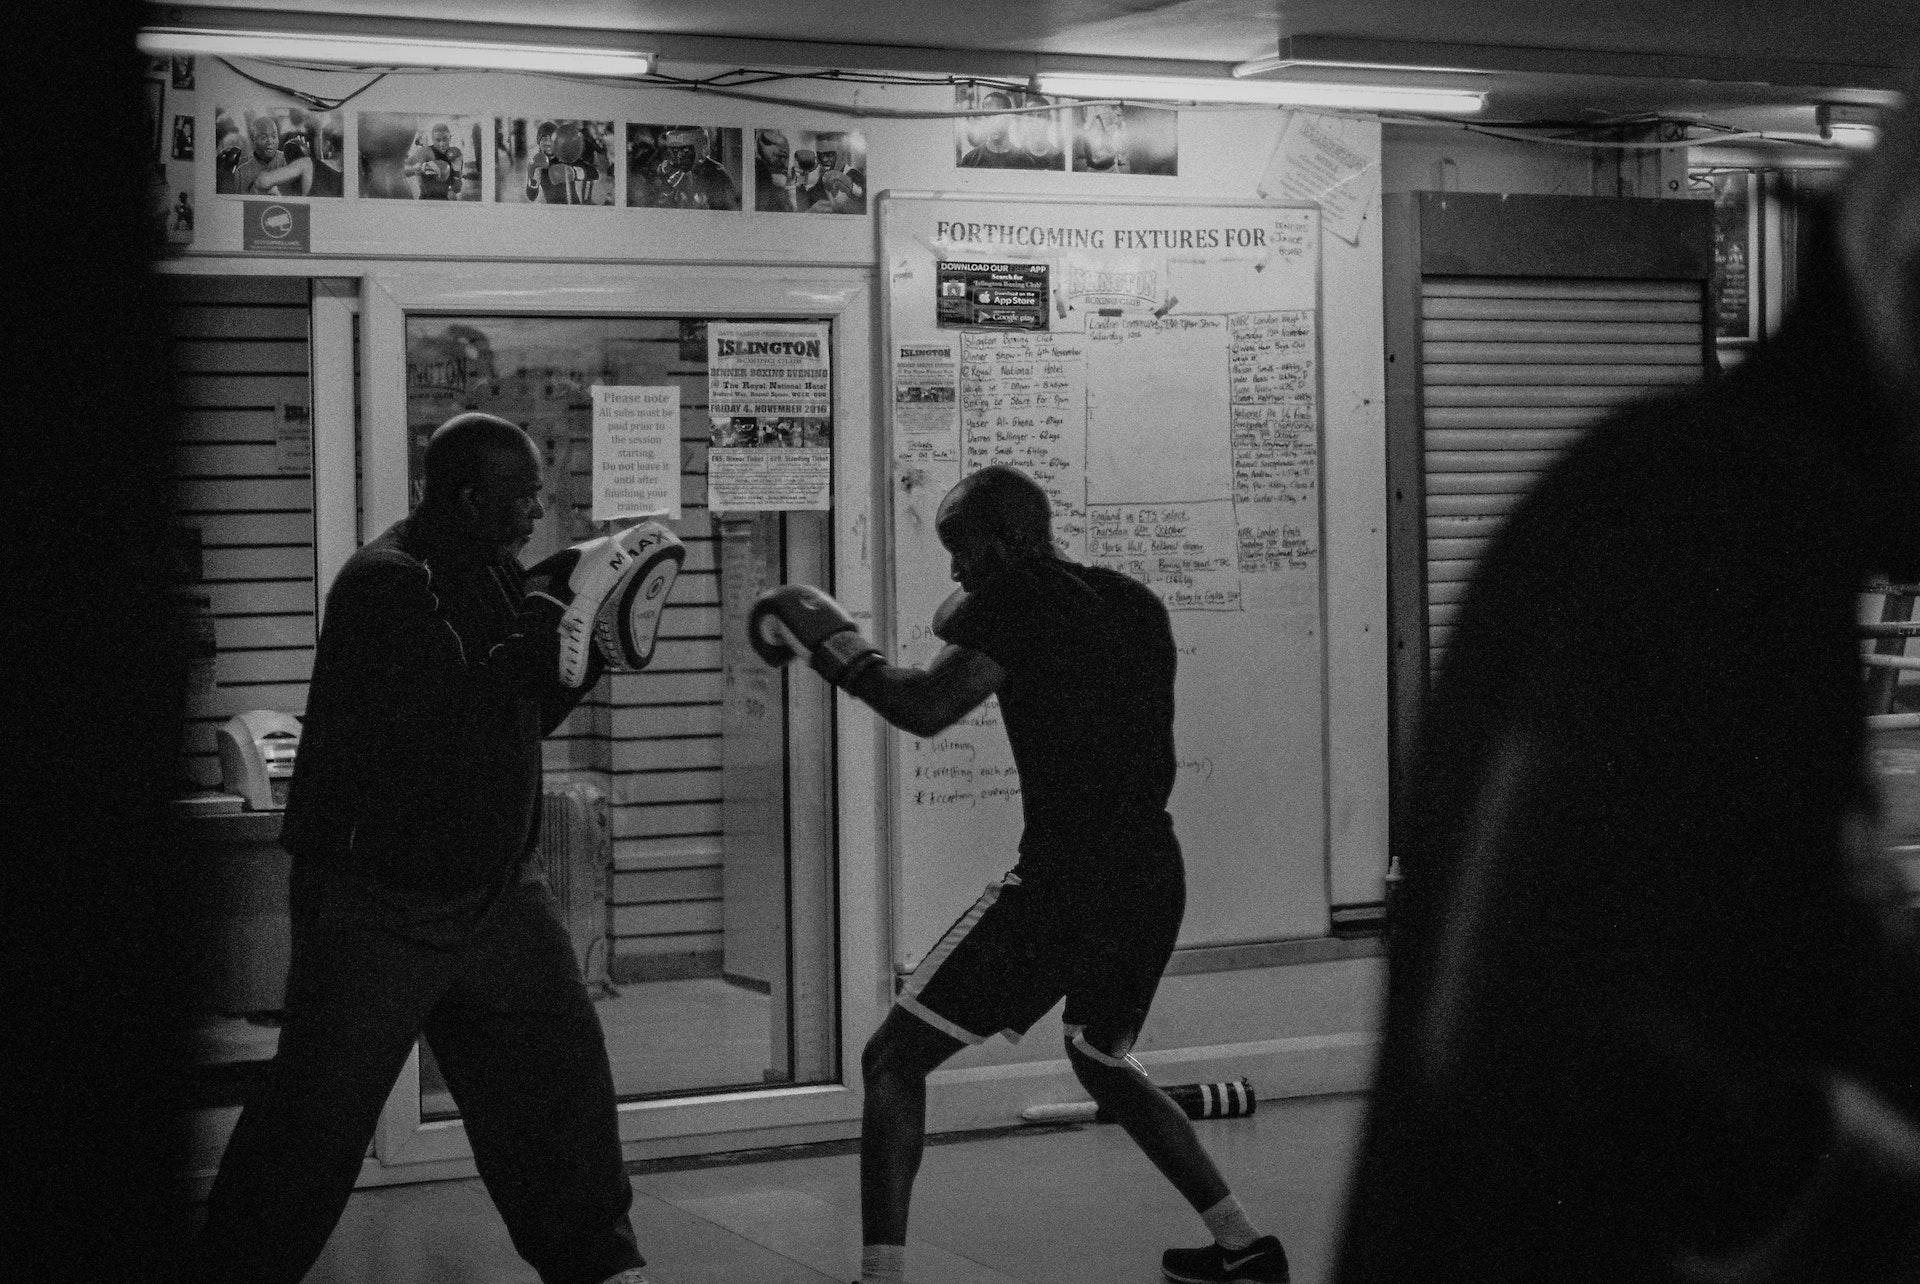 Islington_Boxing_Club-6